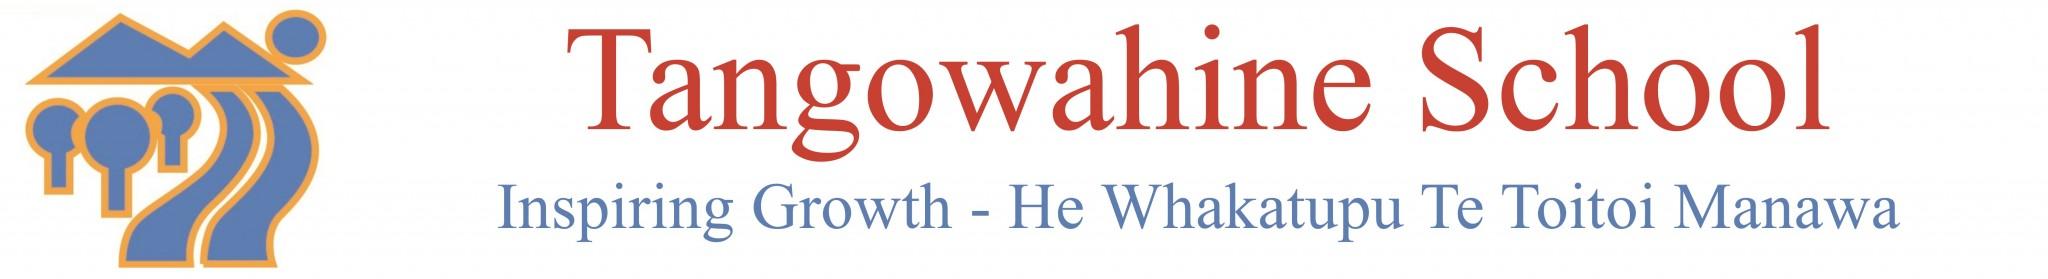 Tangowahine School Logo